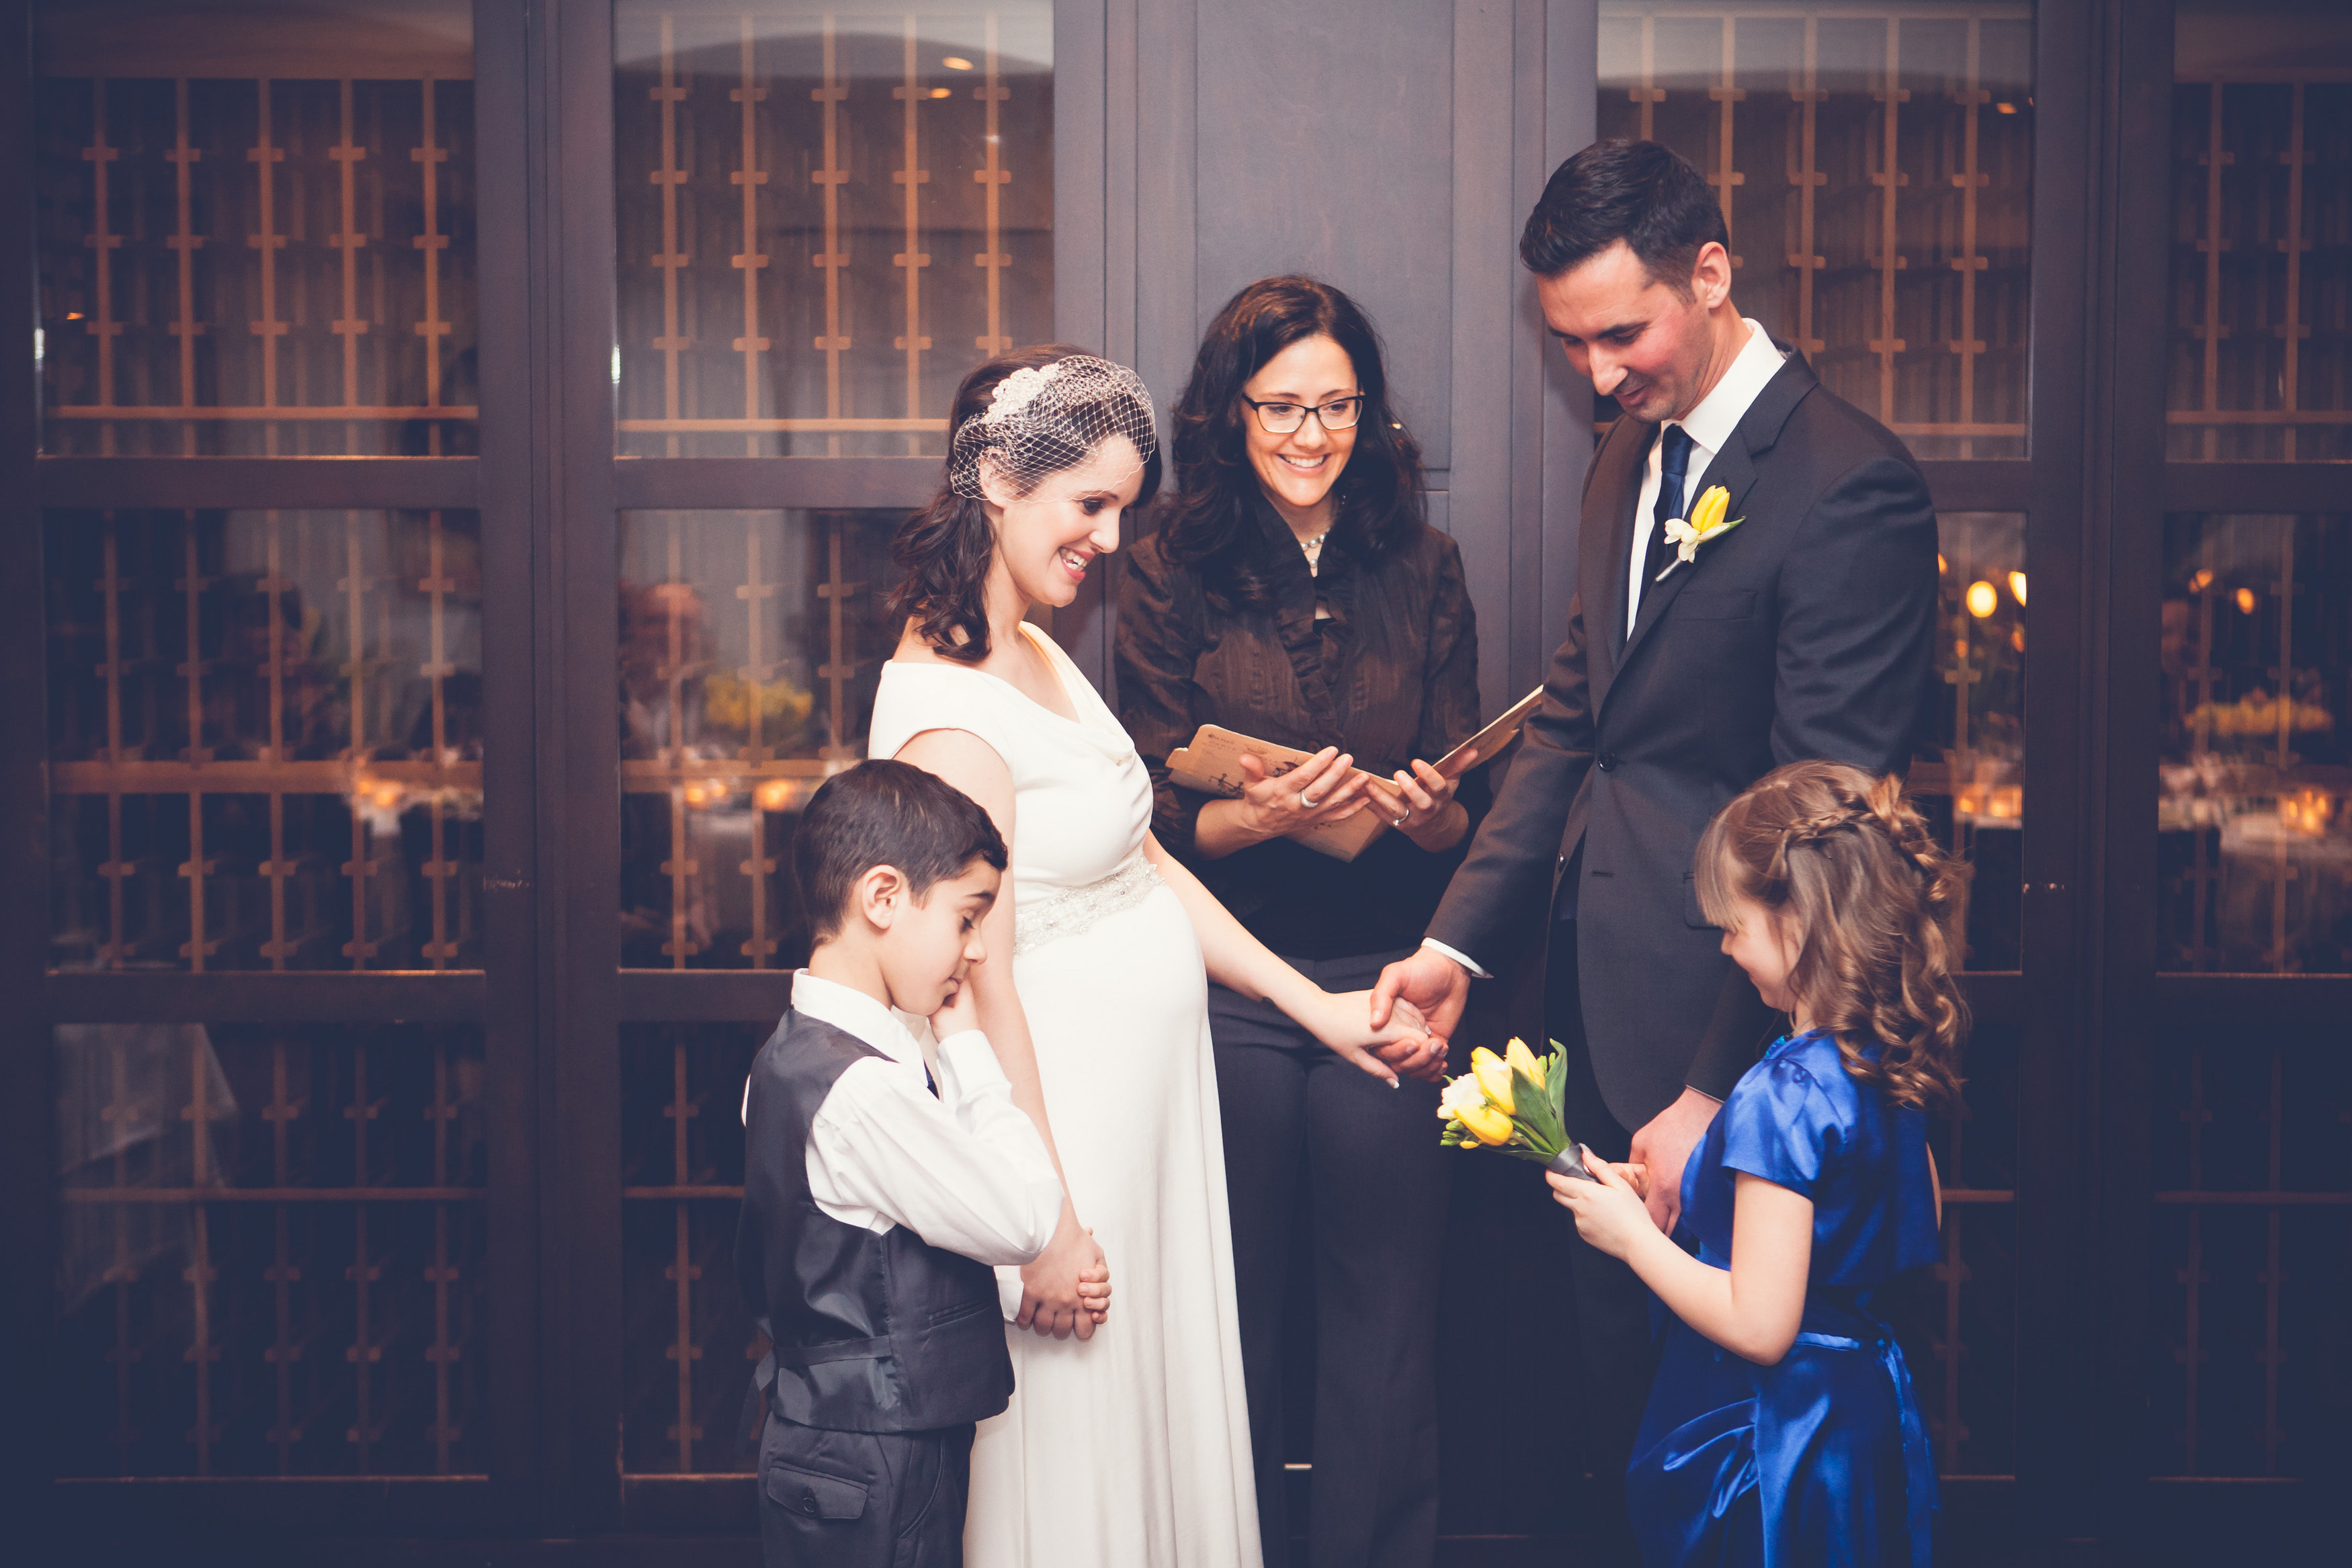 Sassafraz Wedding Officiant